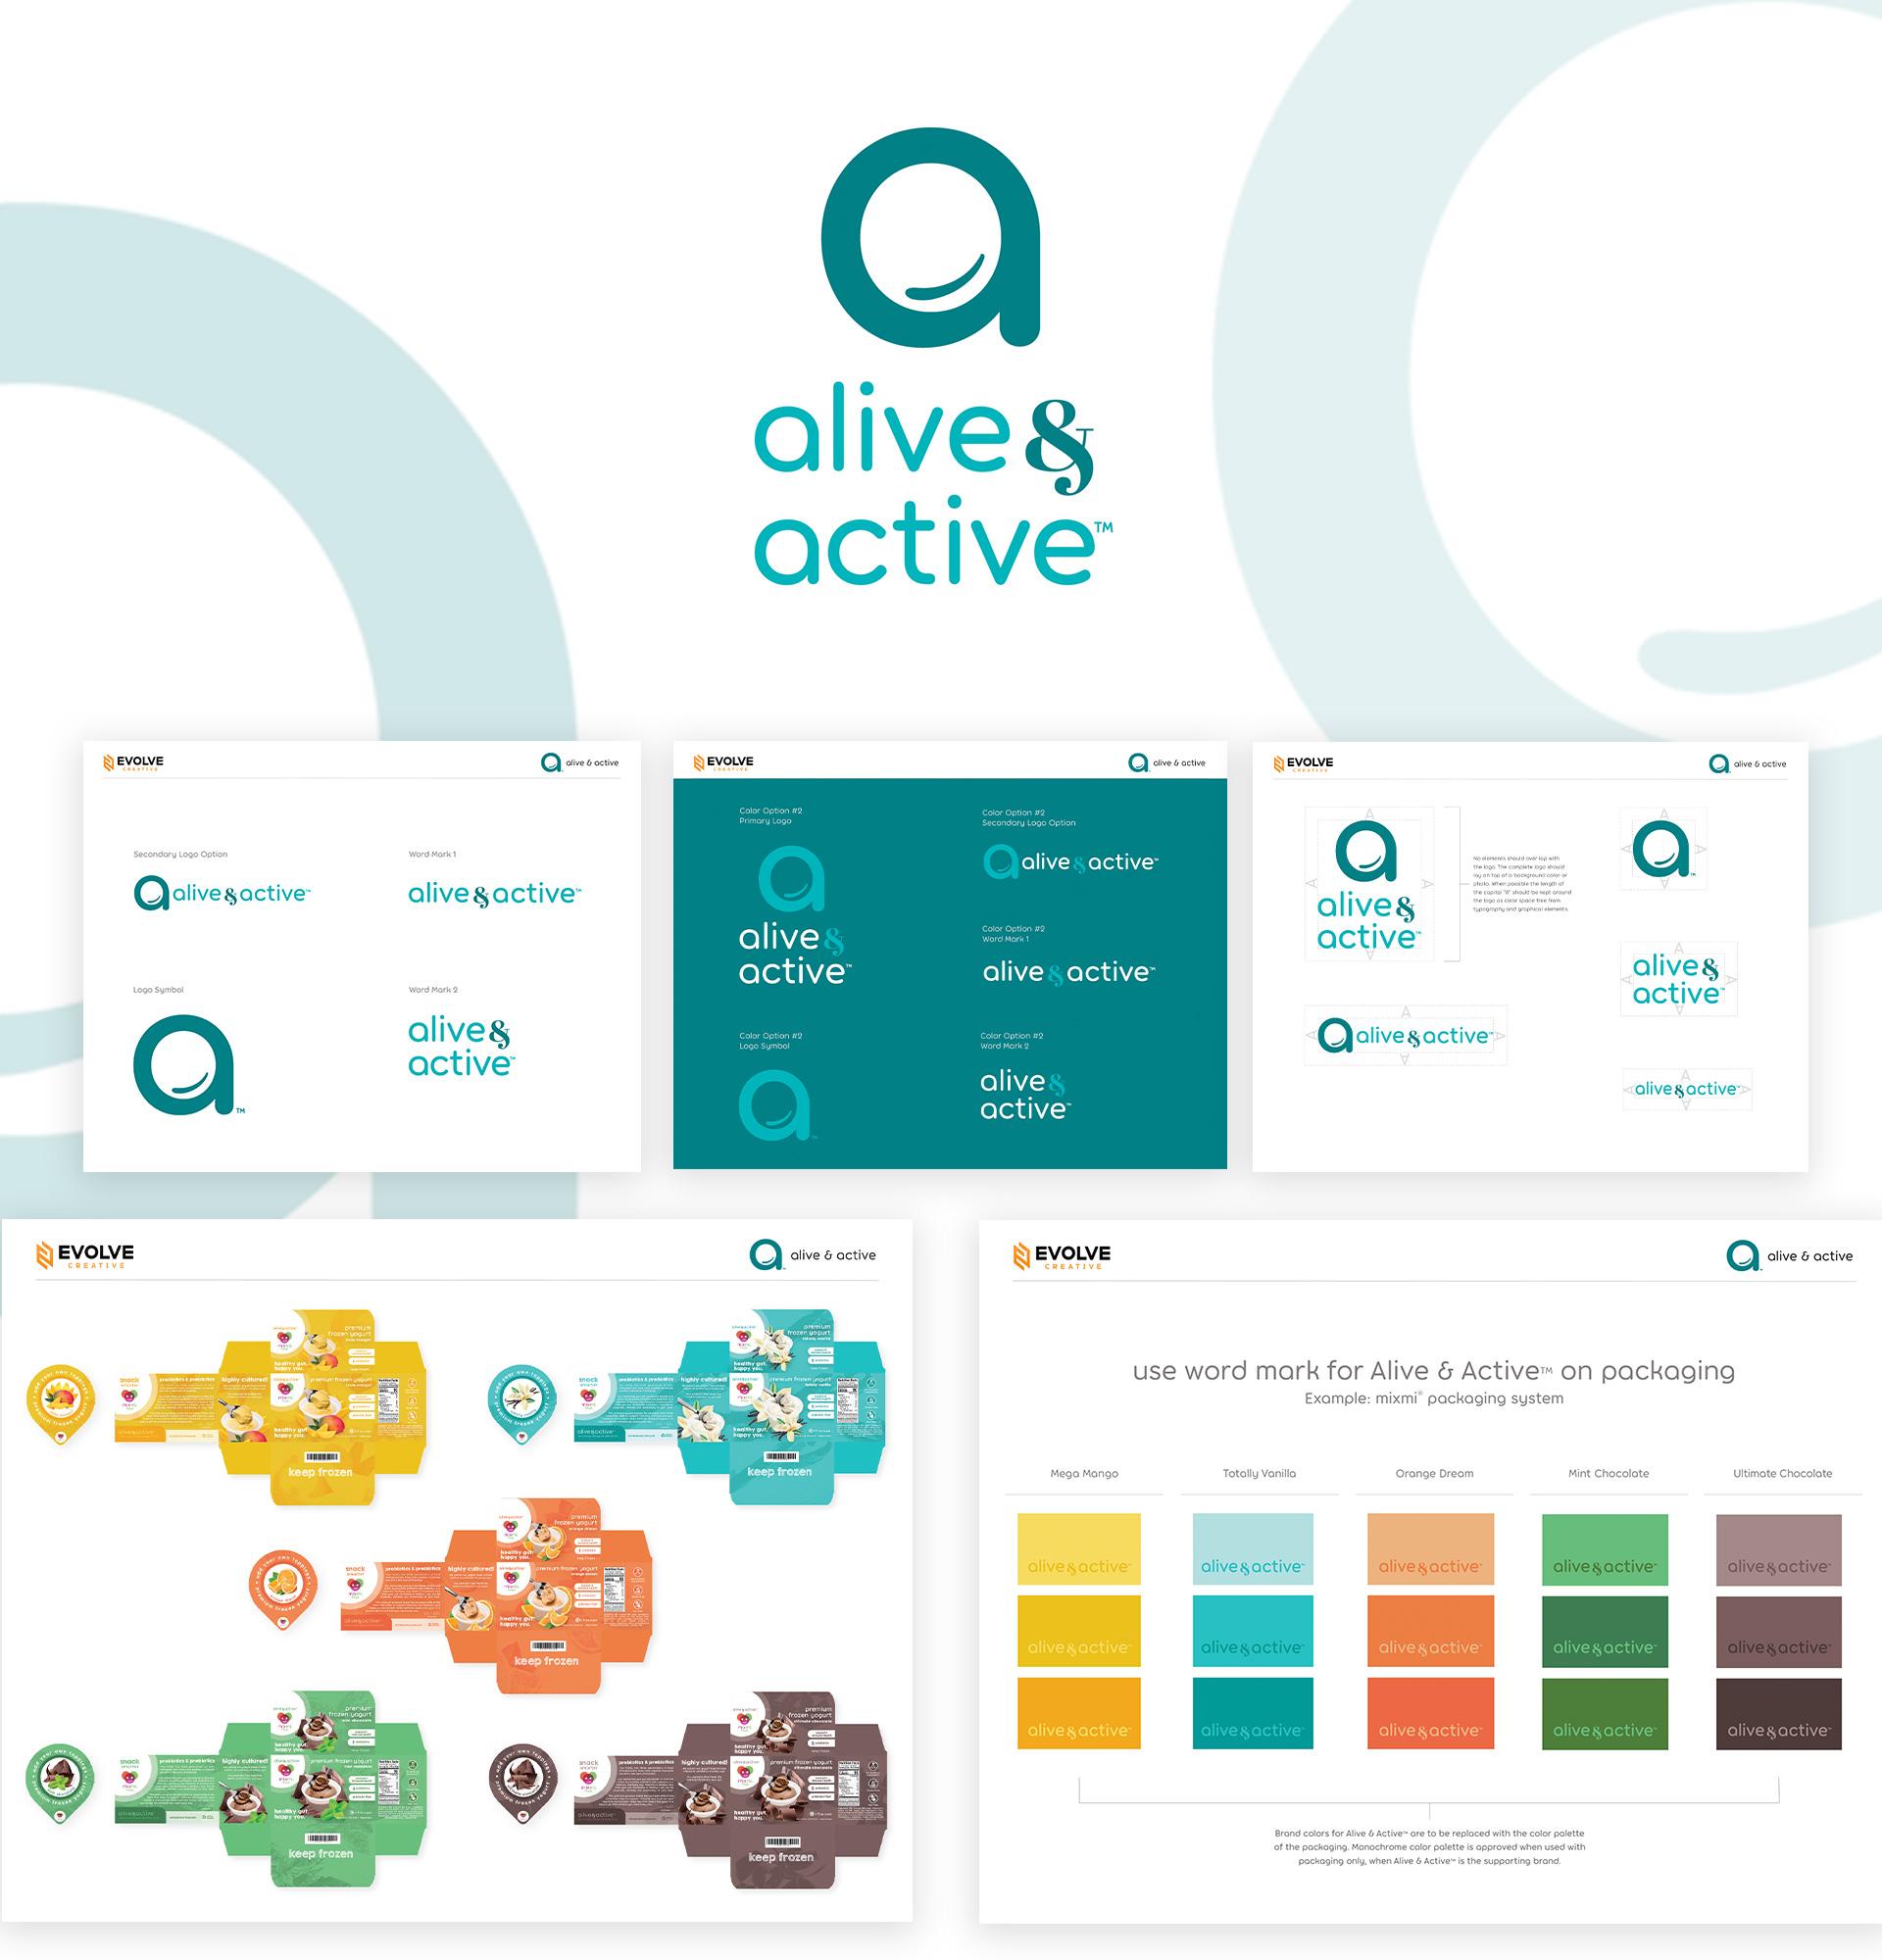 Alive & Active branding